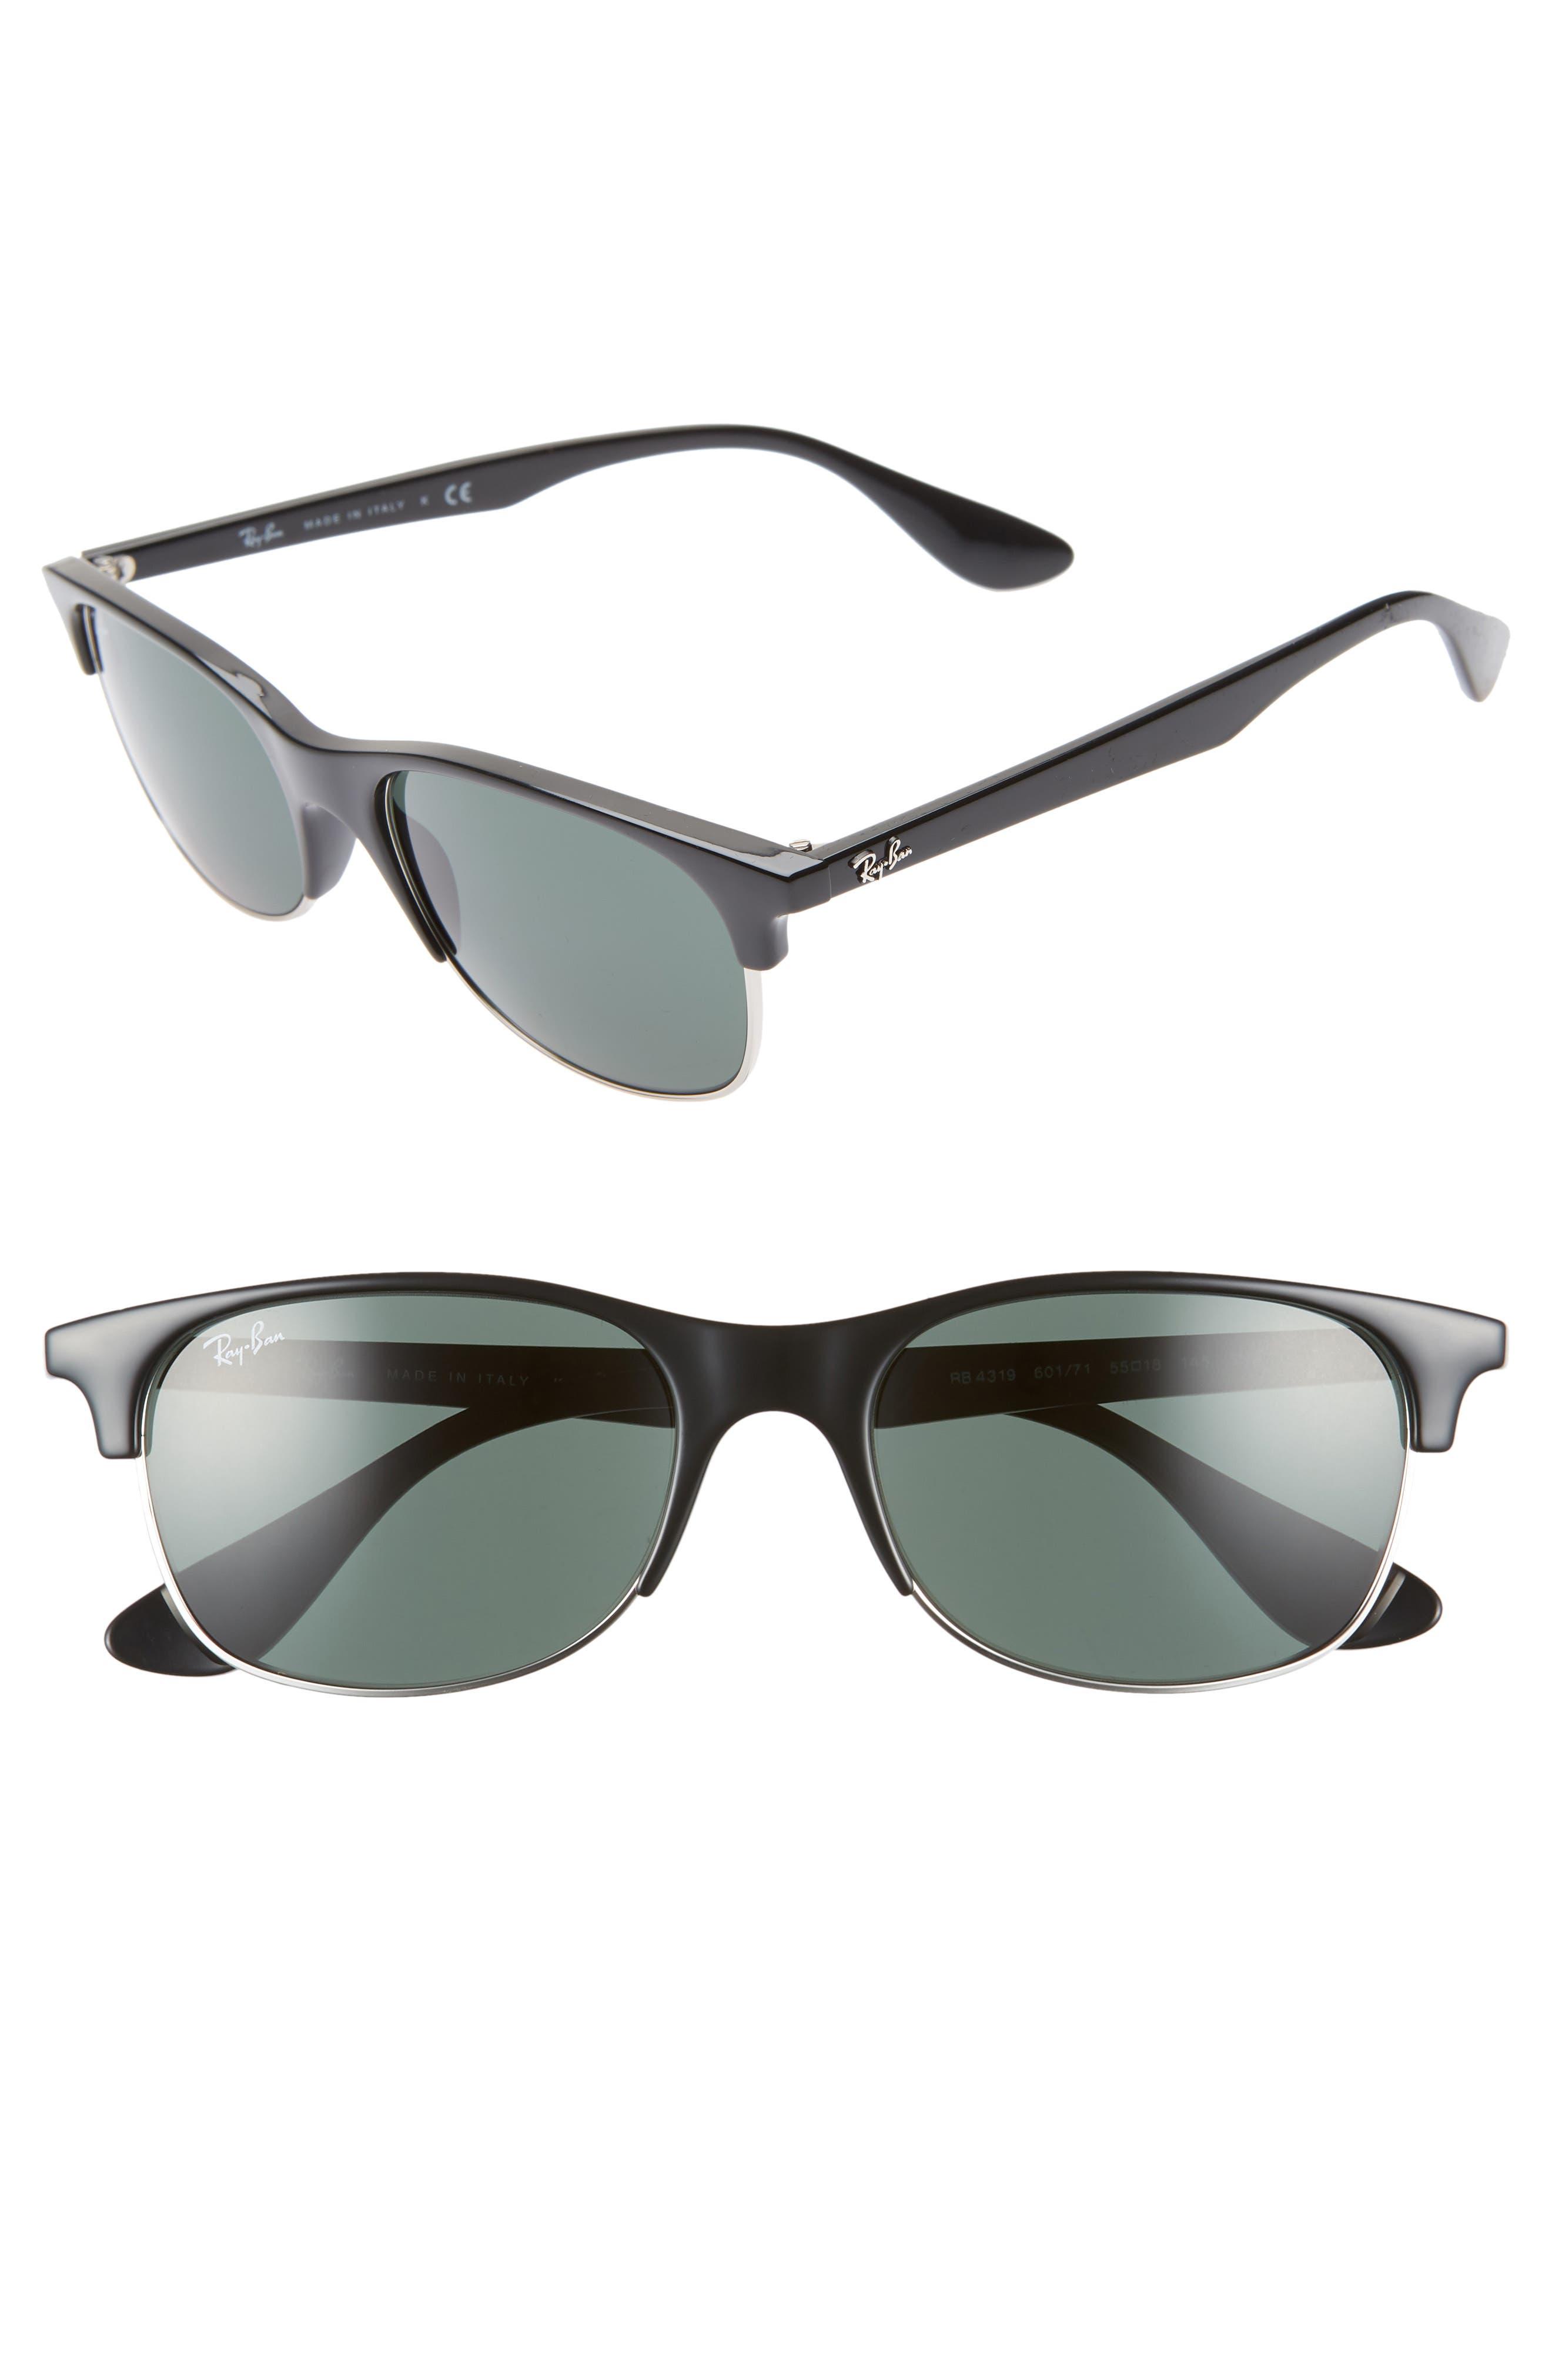 Ray-Ban 55Mm Sunglasses - Black/ Dark Green Solid